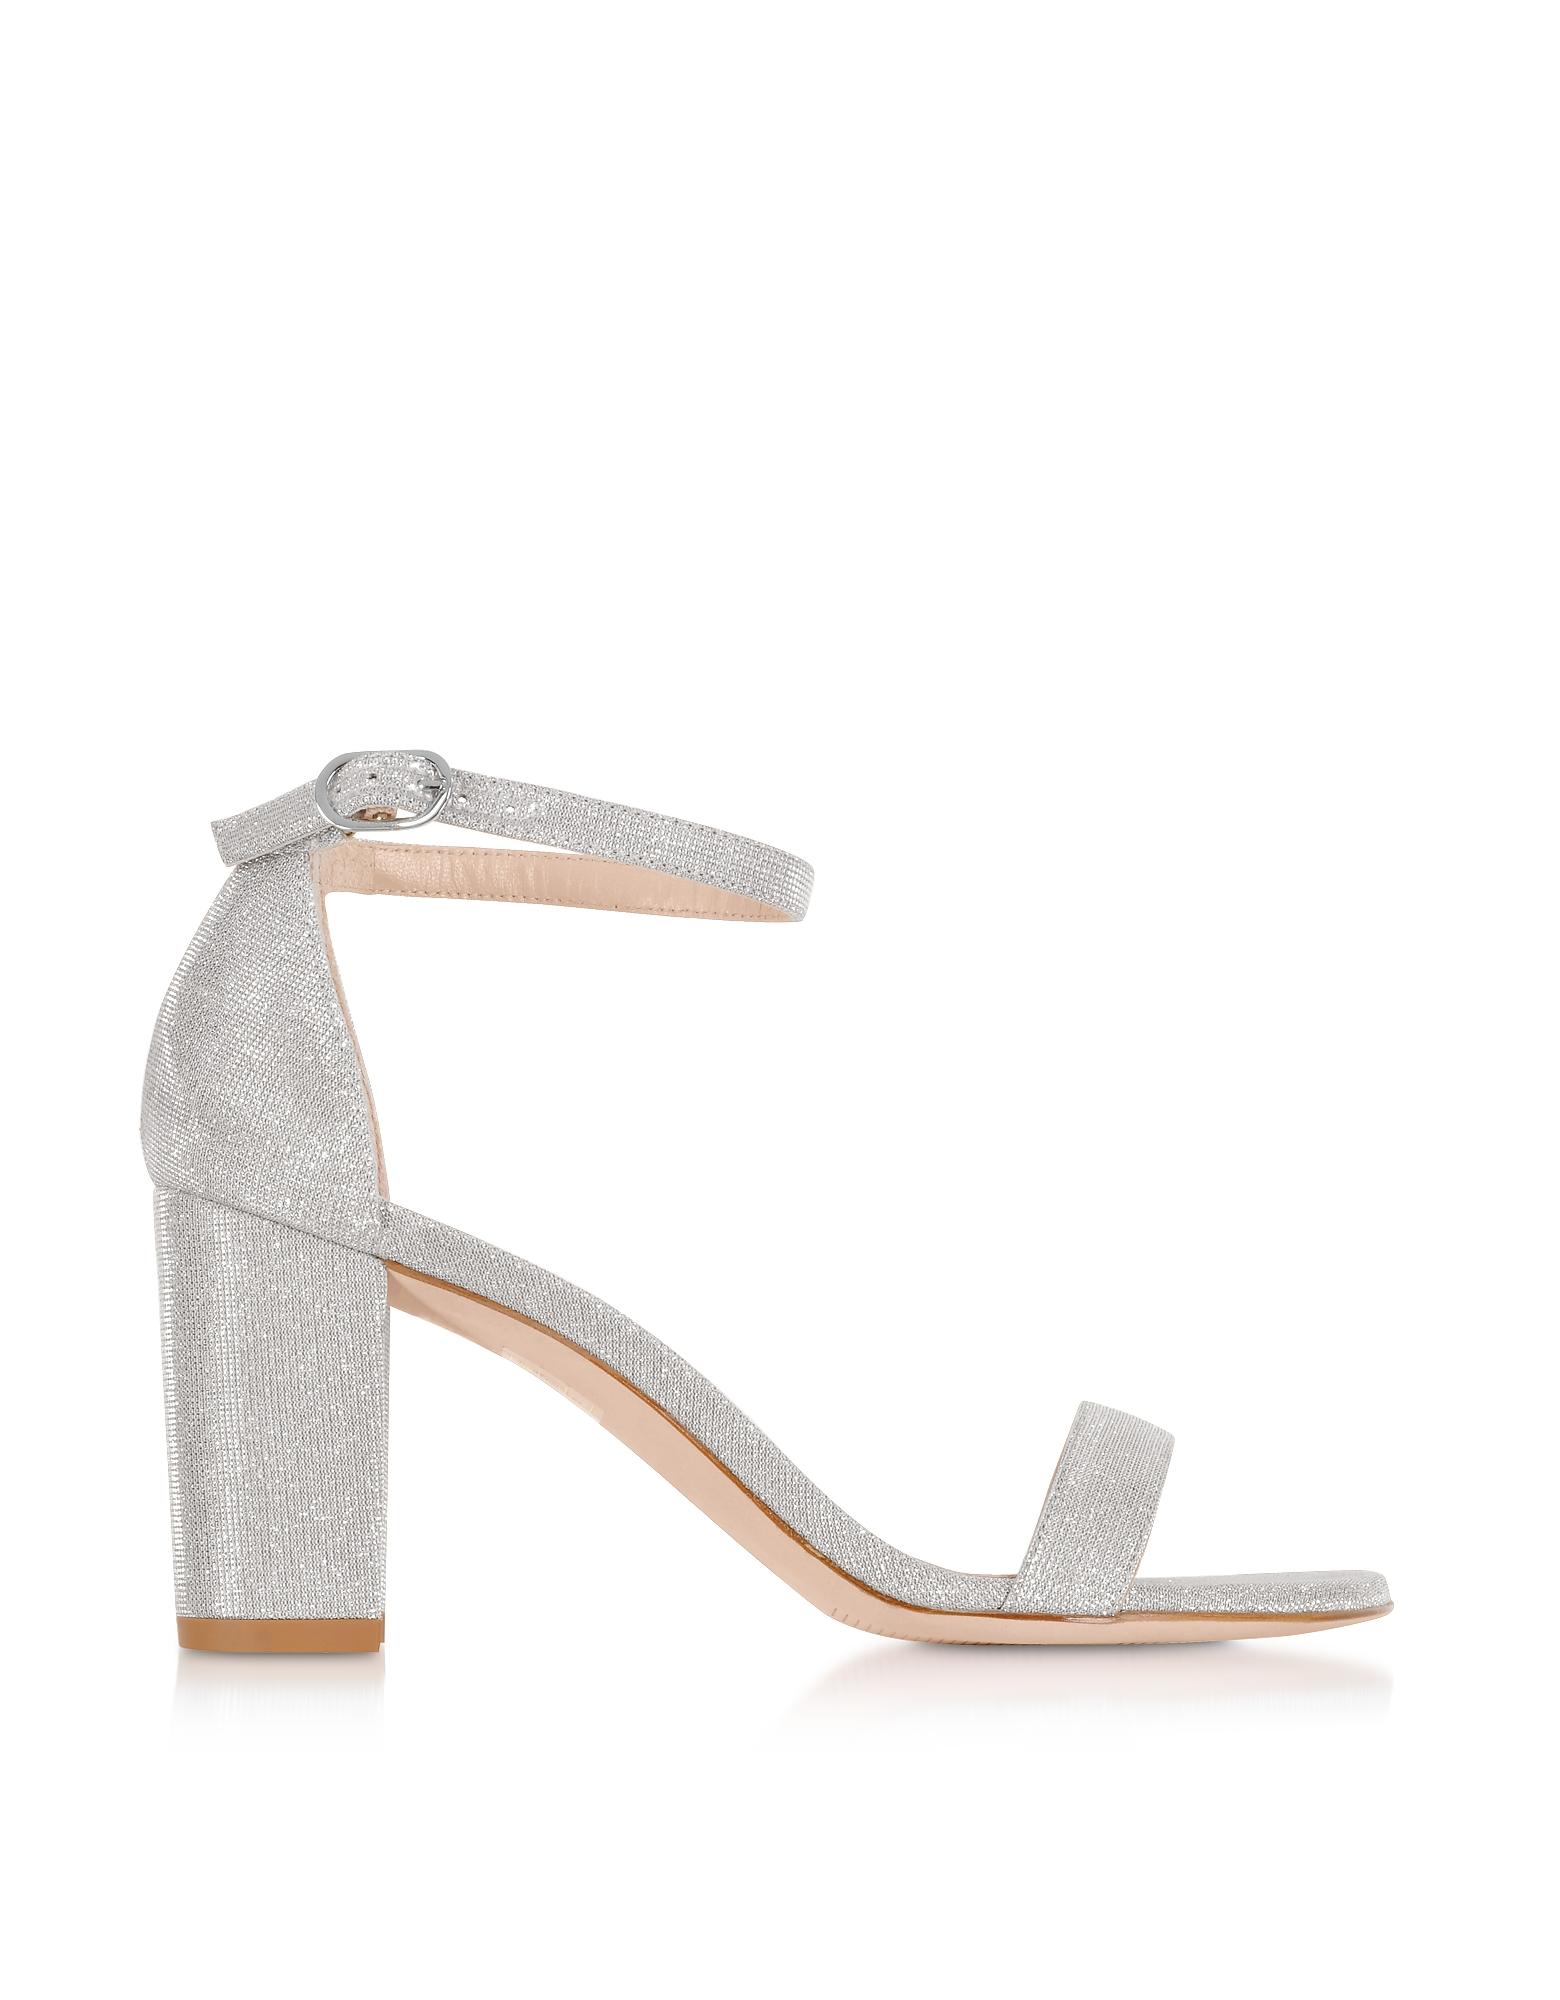 Nearlynude Silver Lurex Block Heel Sandals